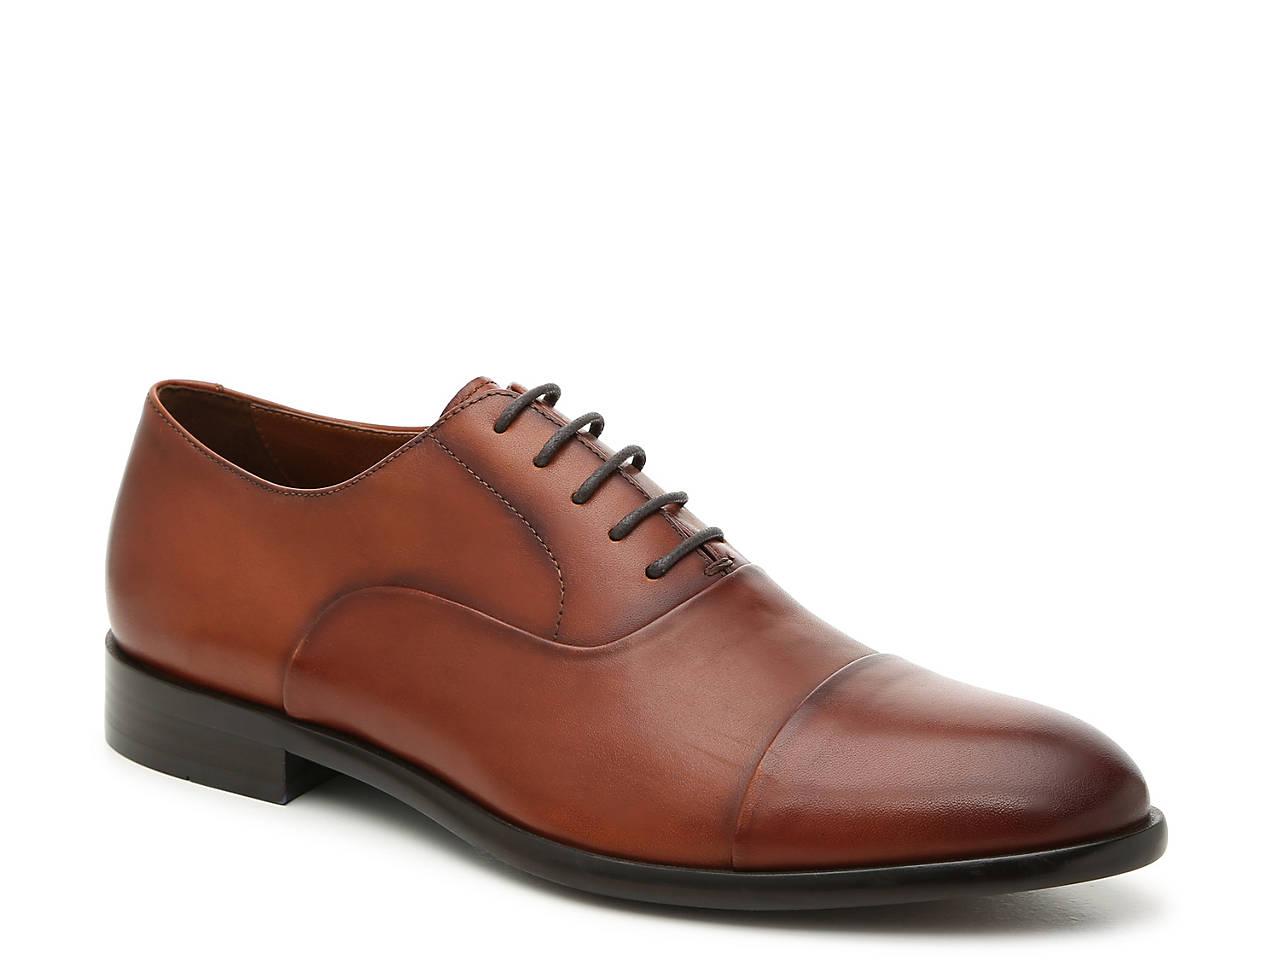 3a600775236b Blake McKay Lawson T15 Cap Toe Oxford Men's Shoes | DSW